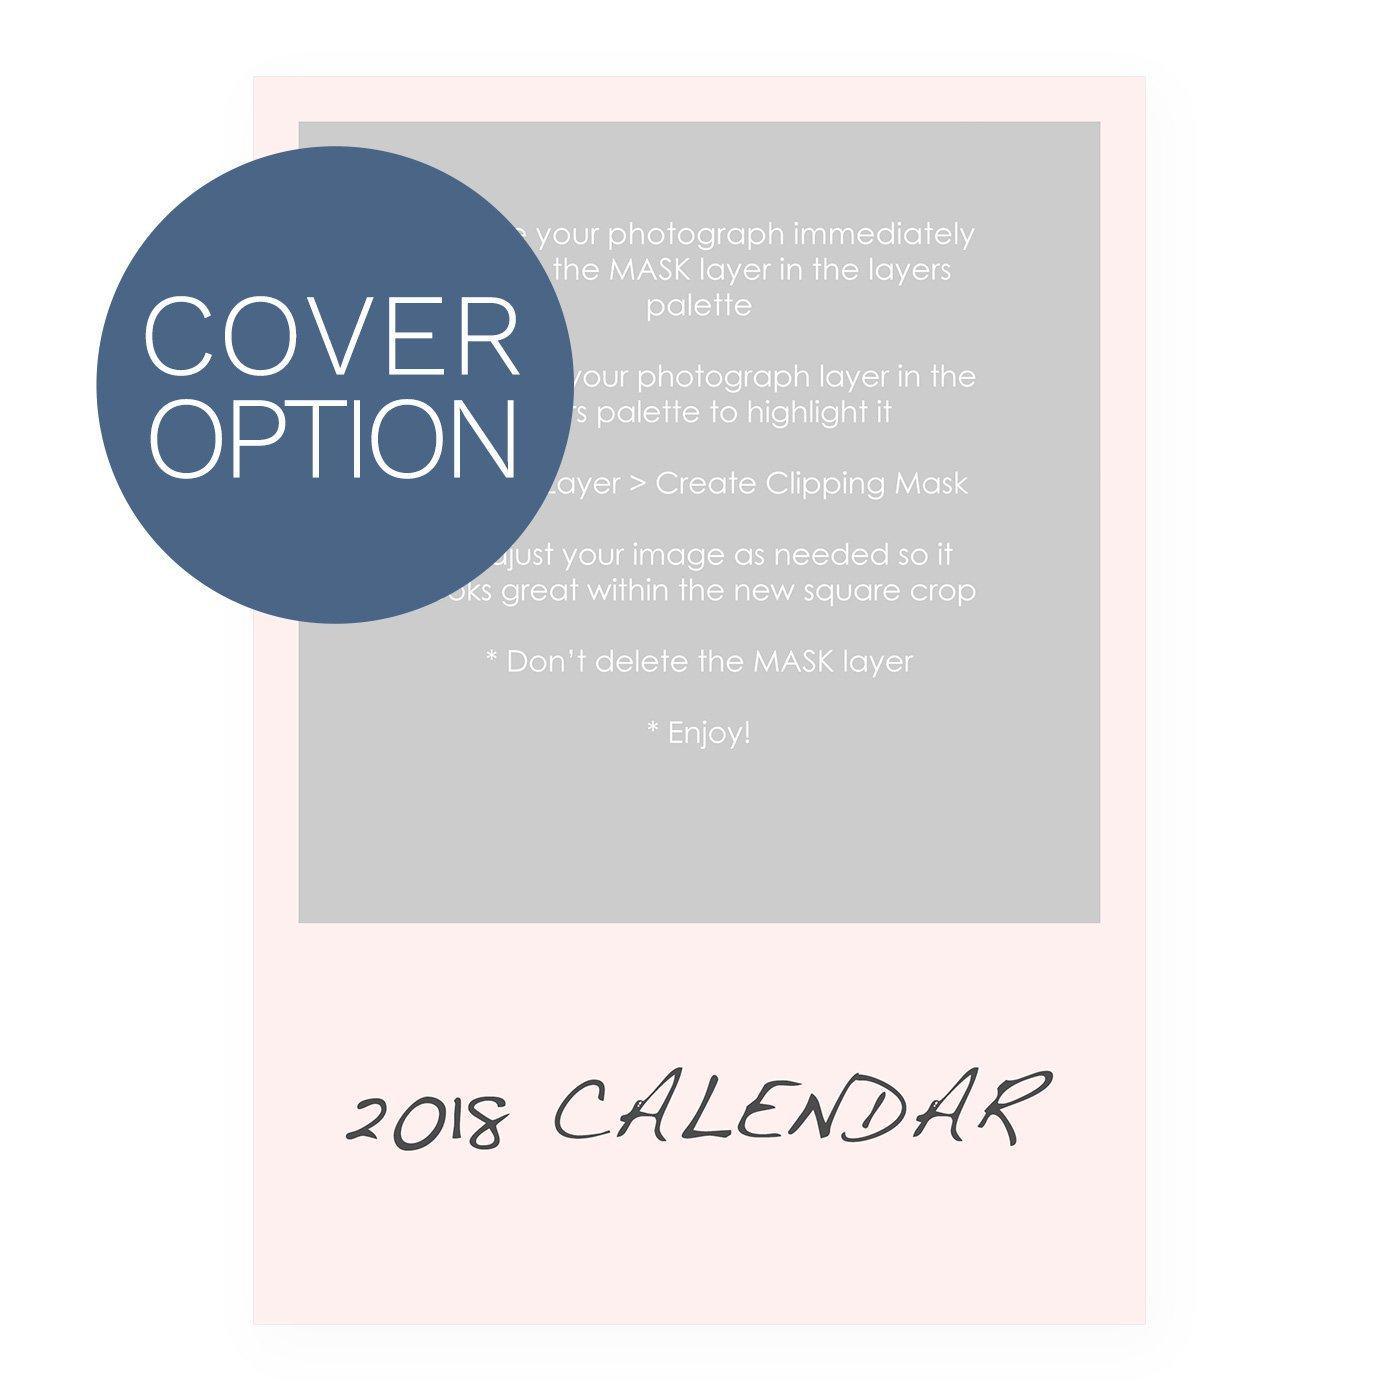 2018 Calendar Template - Border